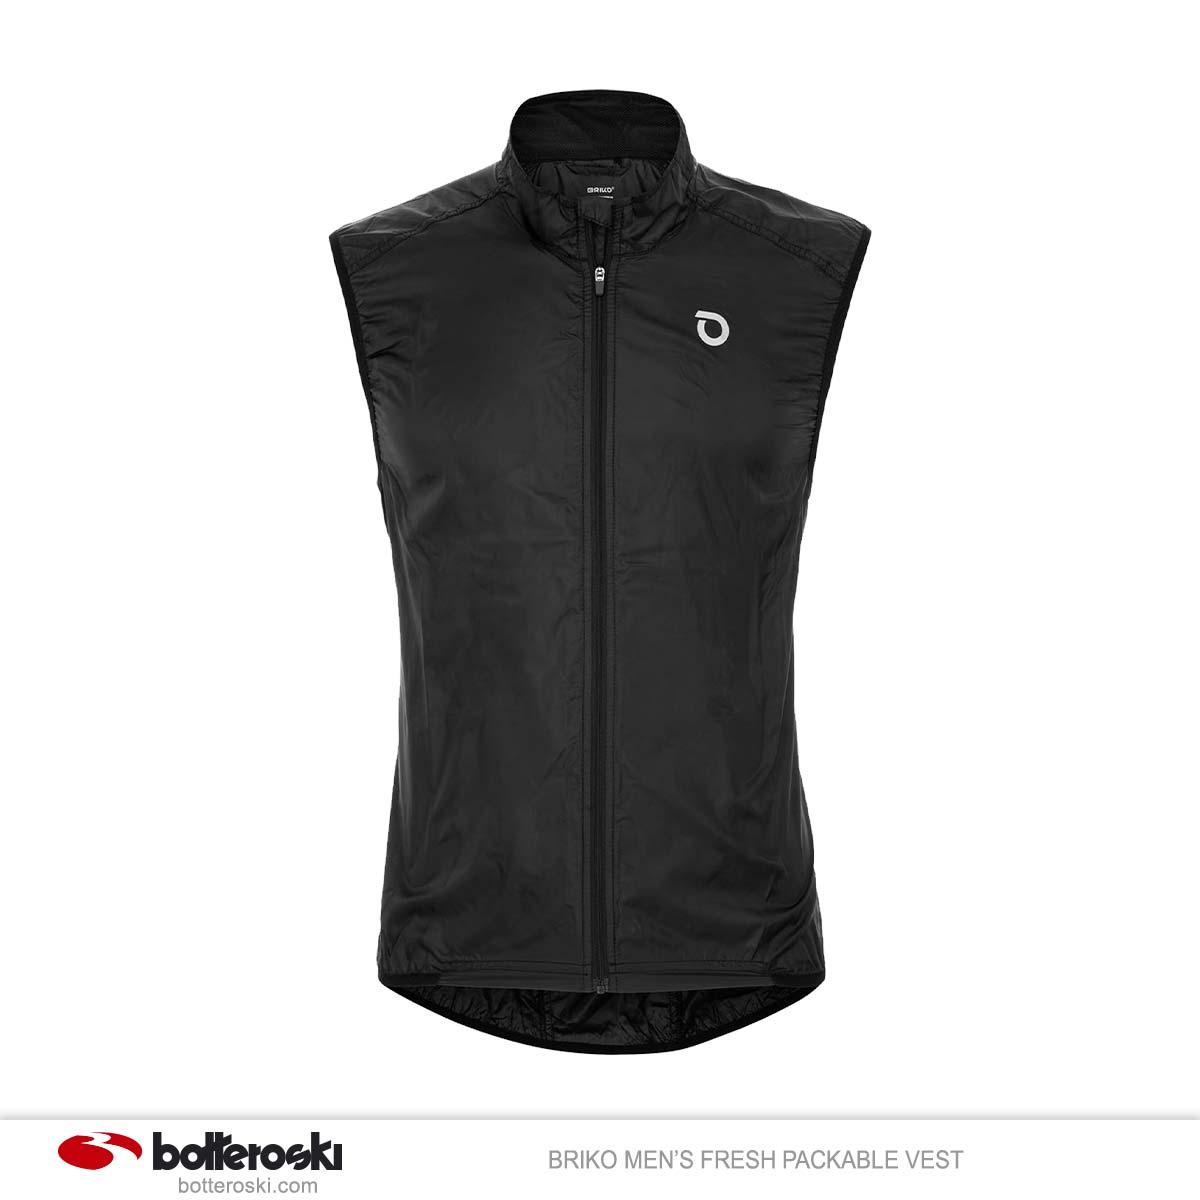 Gilet Uomo Briko Fresh Packable Vest